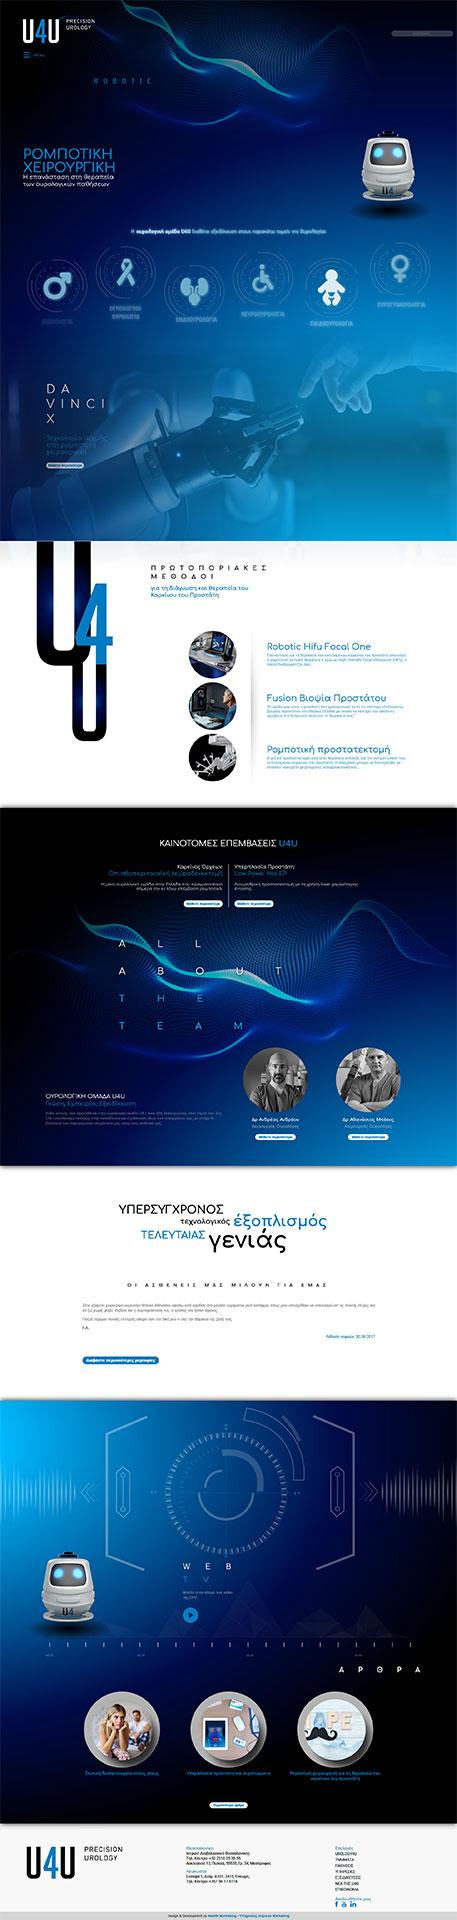 u4u home page